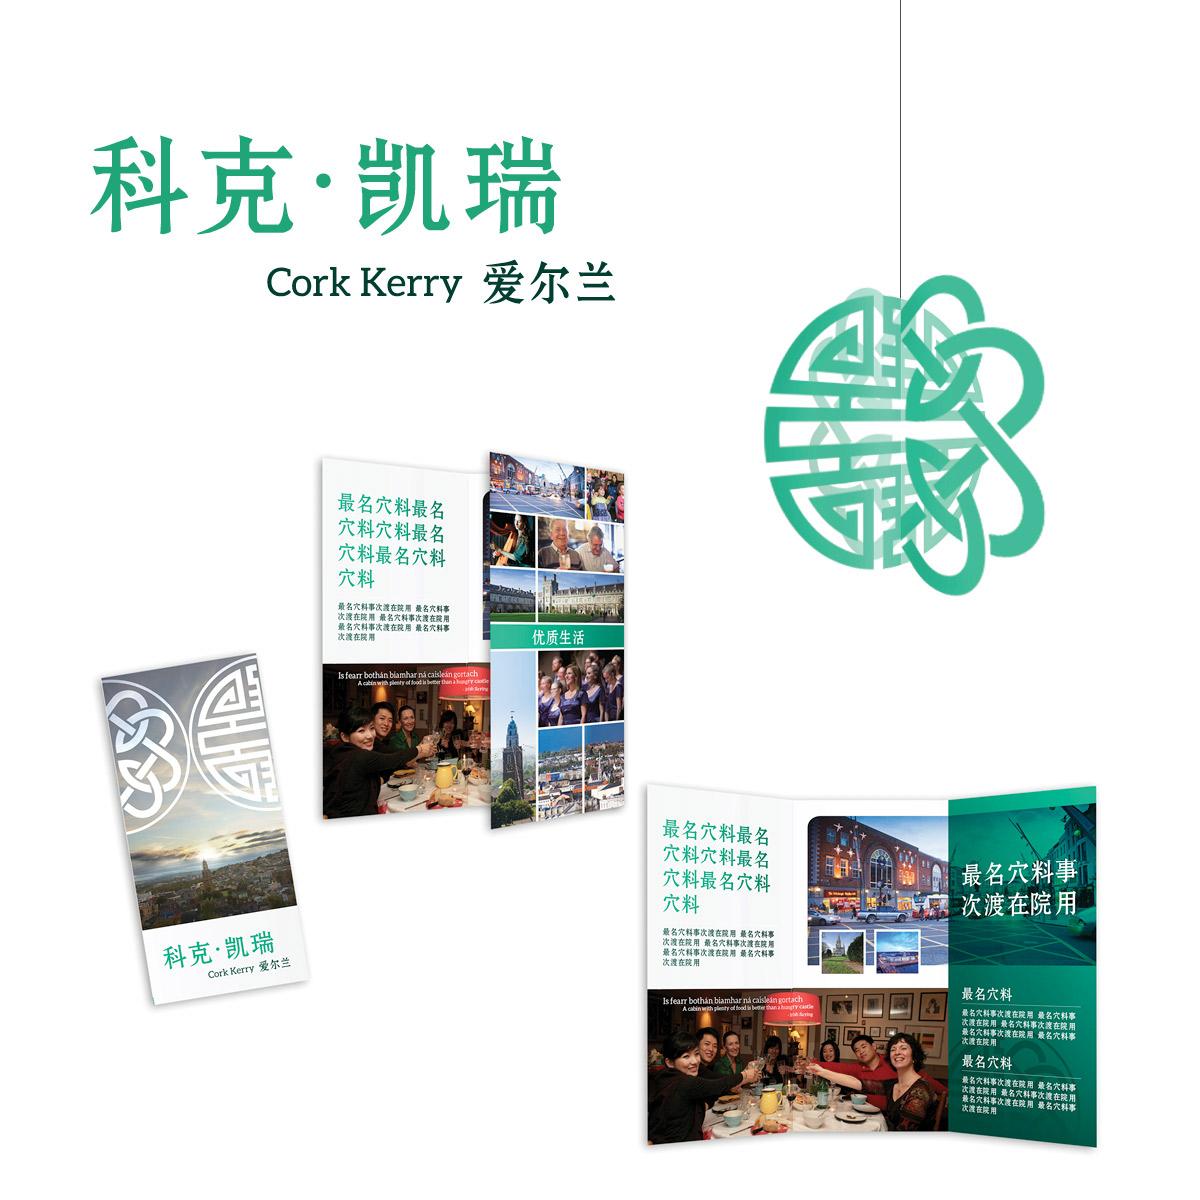 CorkCityCouncil_BeijingExhibit_01.jpg